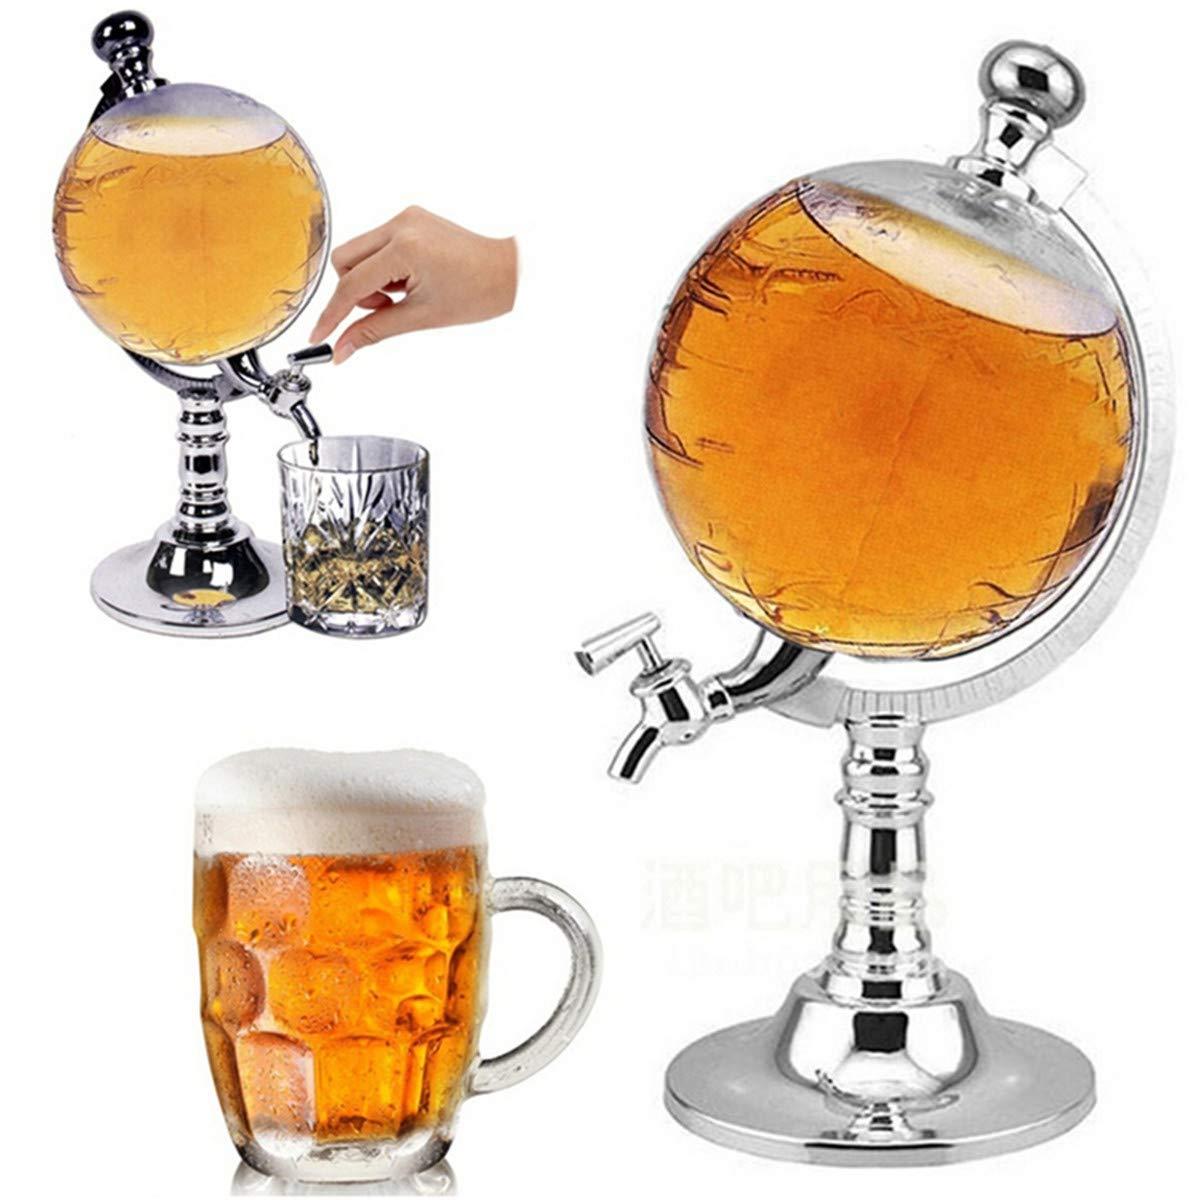 Janolia 1000ml/ 33.82 oz Globe Shaped Drink Dispenser, Drinks Decanter, Drink Tower, Beverage Liquor Drink Dispenser with Tap by Janolia